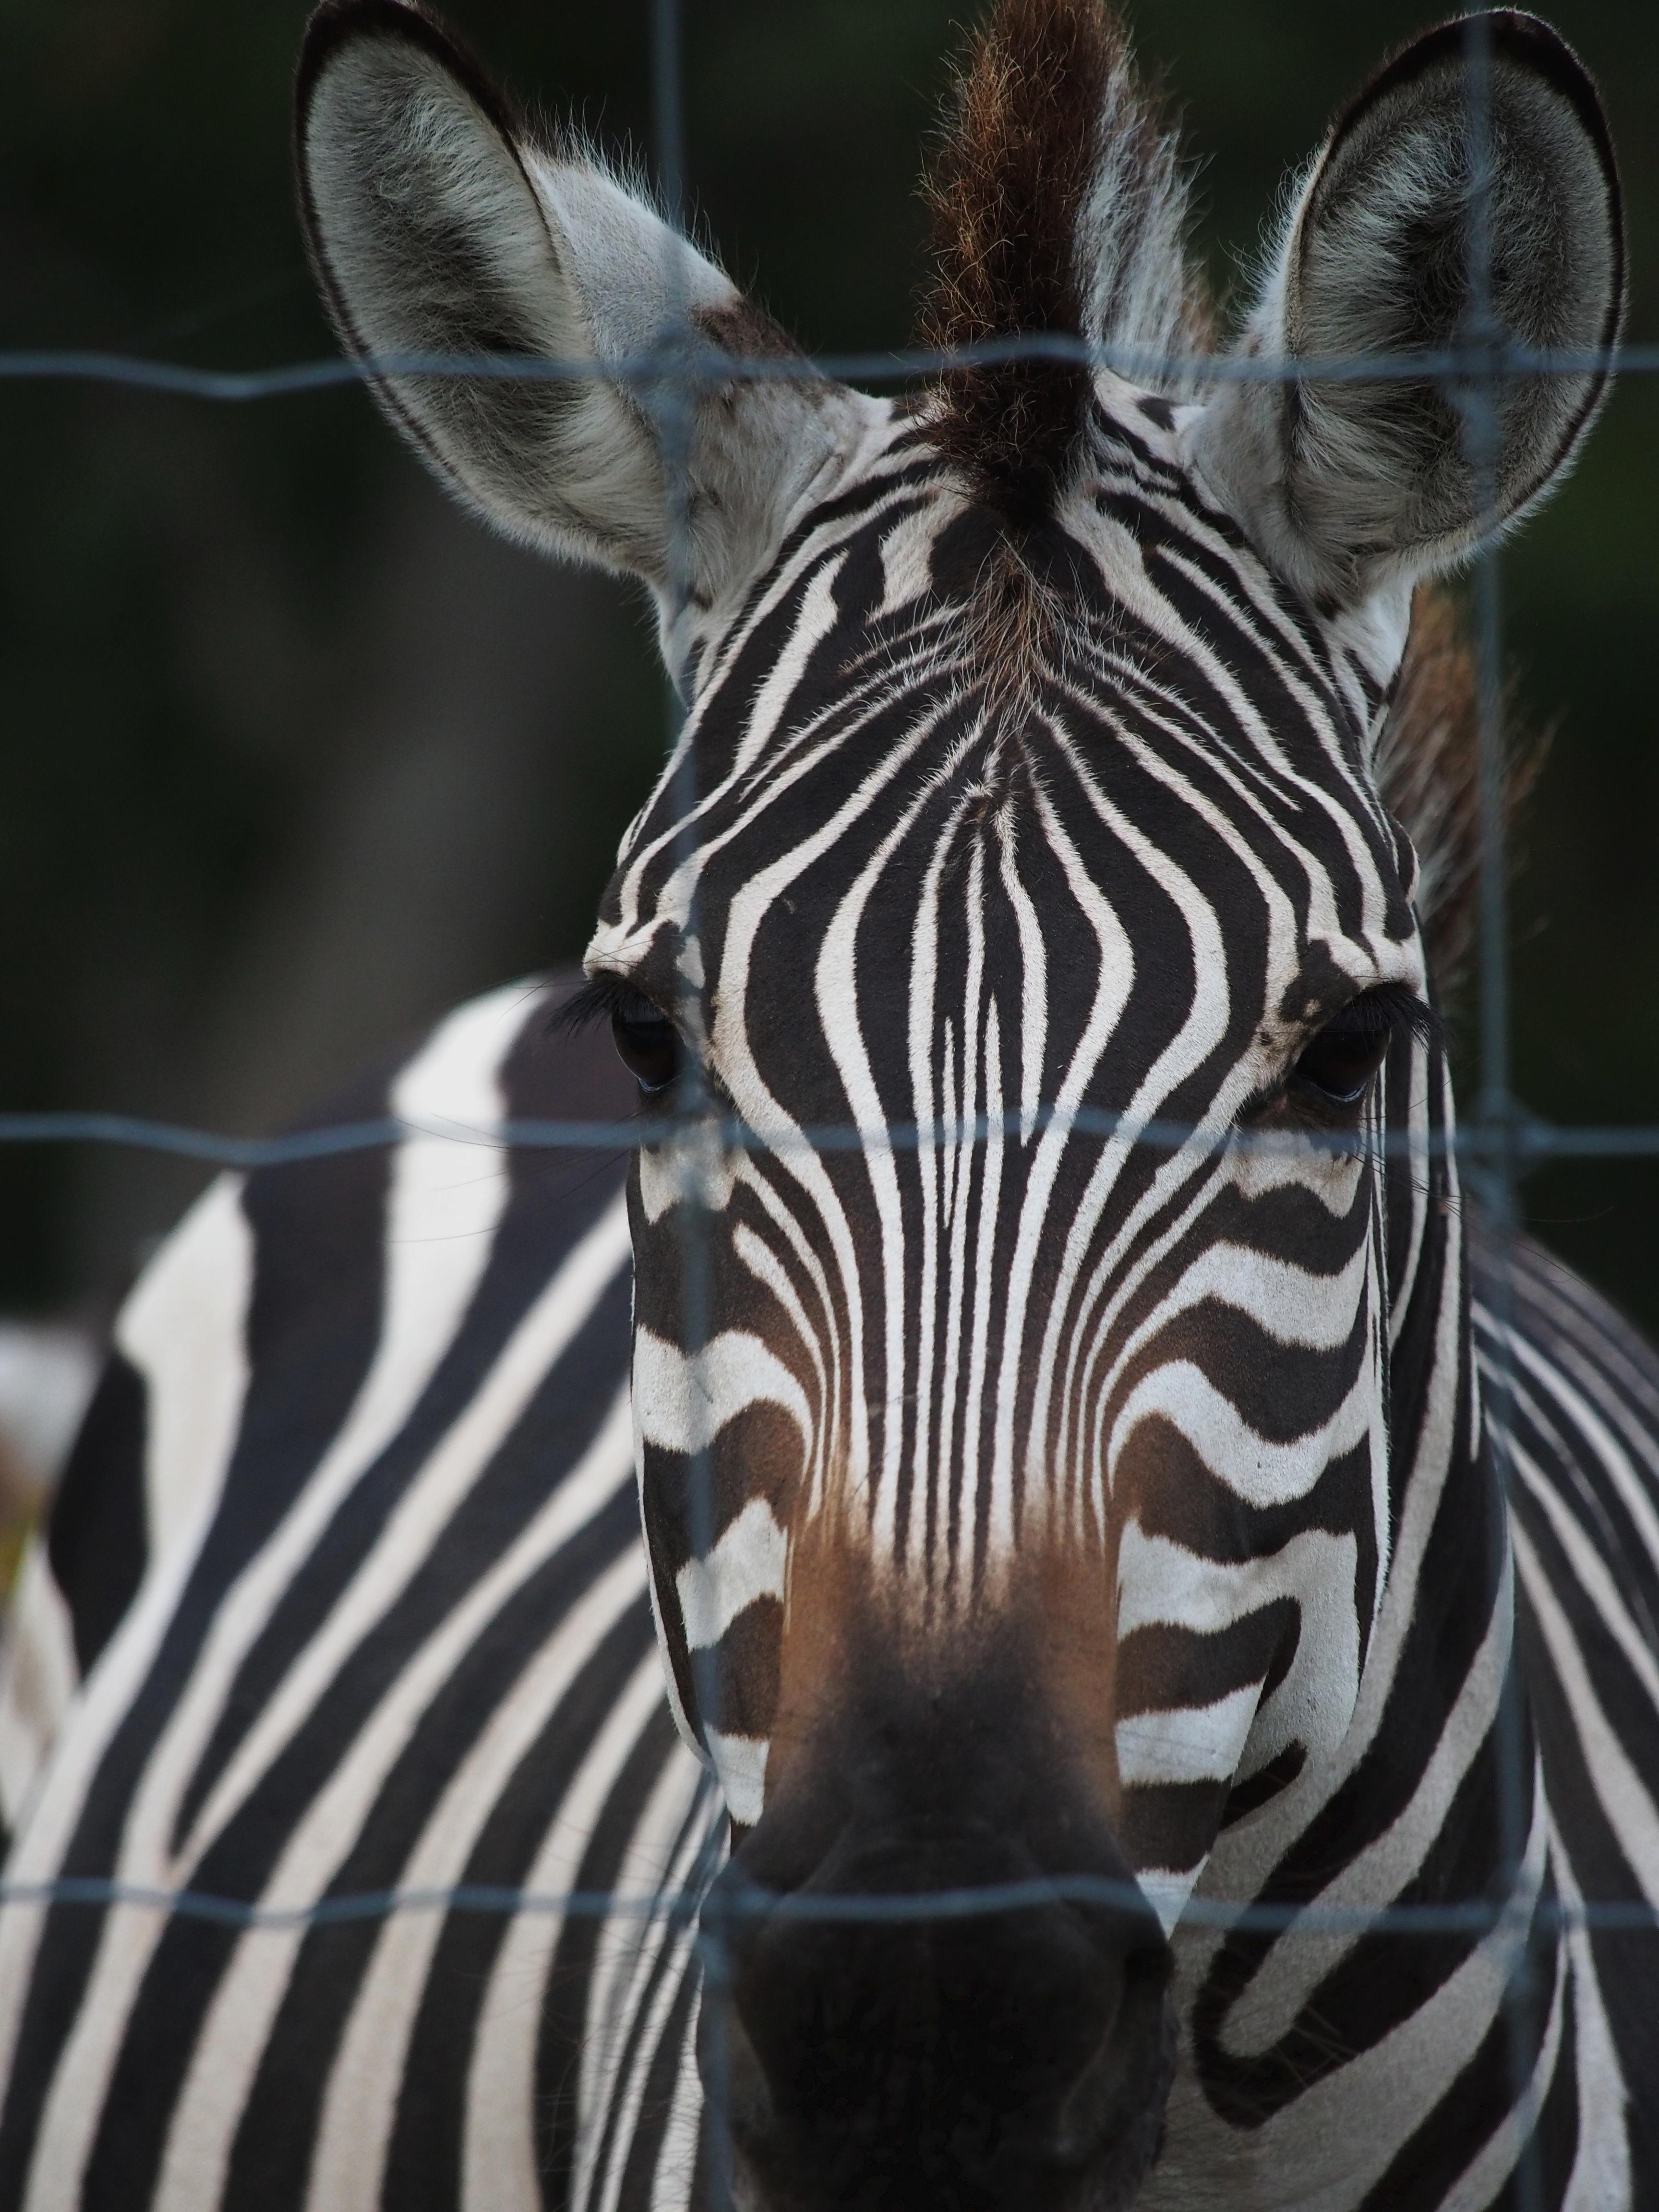 Zebra Without Stripes 40 Types Pics Of Zebra...